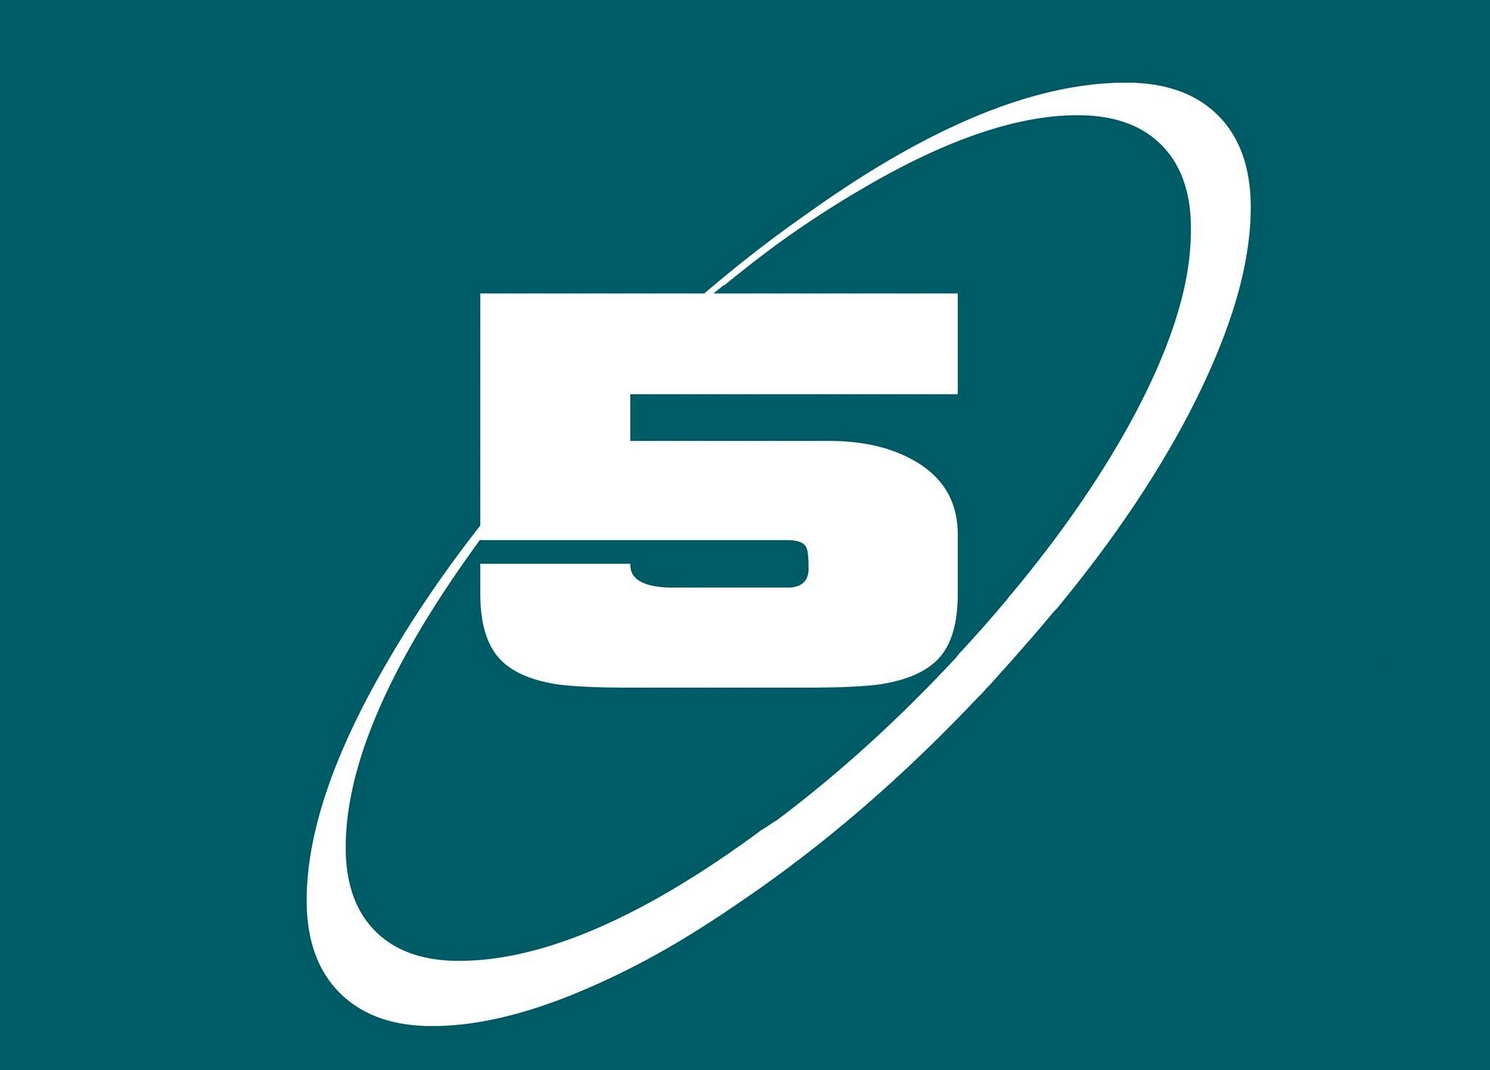 Bretagne 5 rejoint l'application Radioplayer